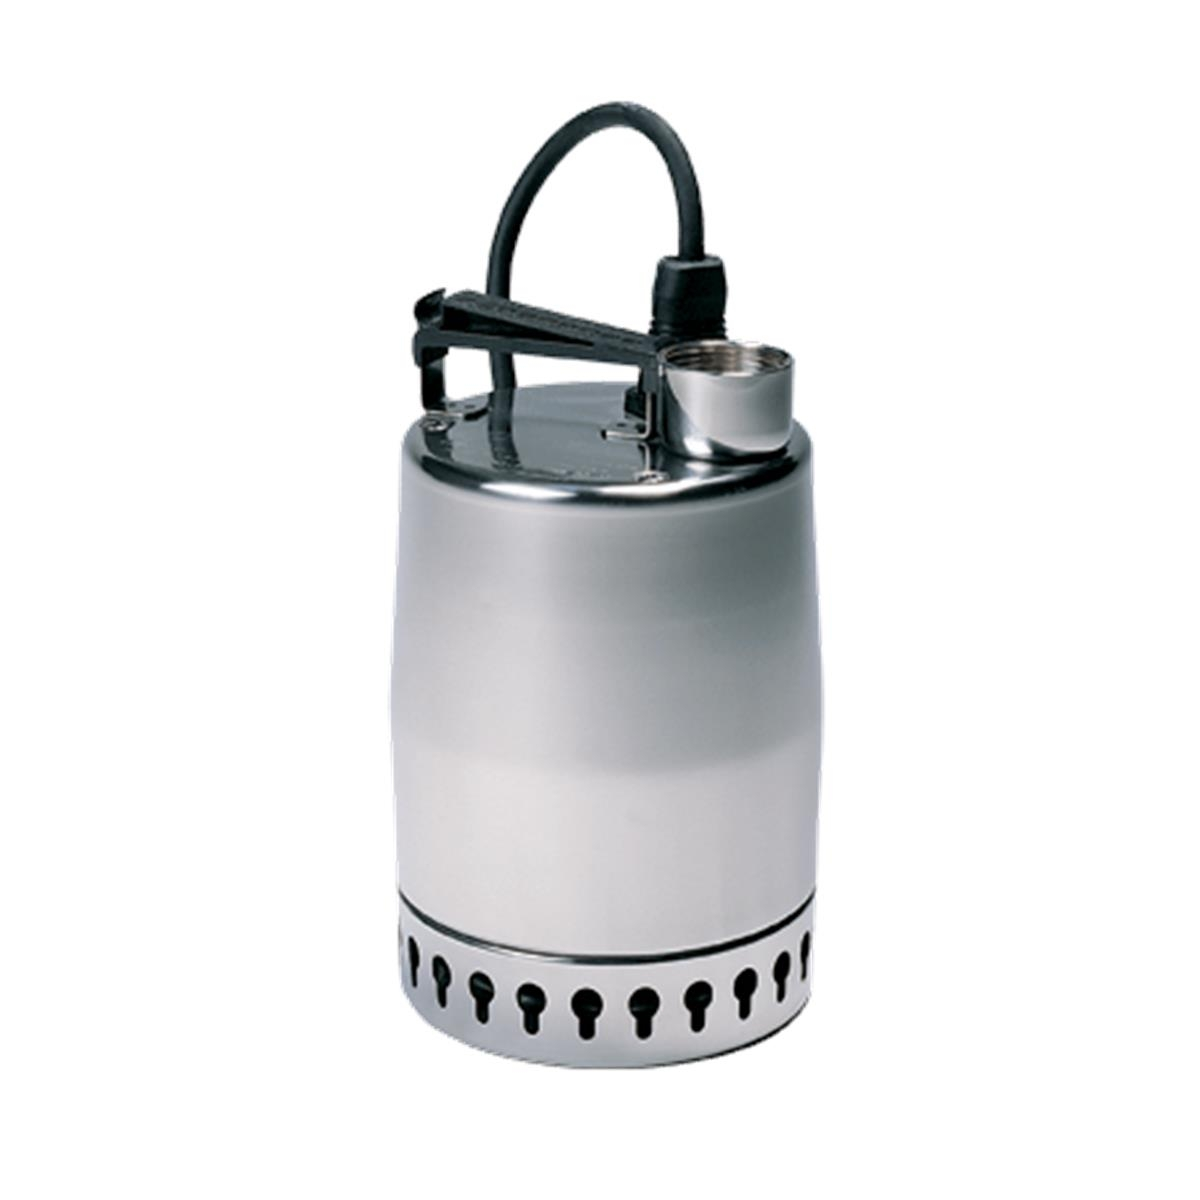 Grundfos Drainage Pump Kp 250 A 1 10m Onninen Pompa Celup 250a